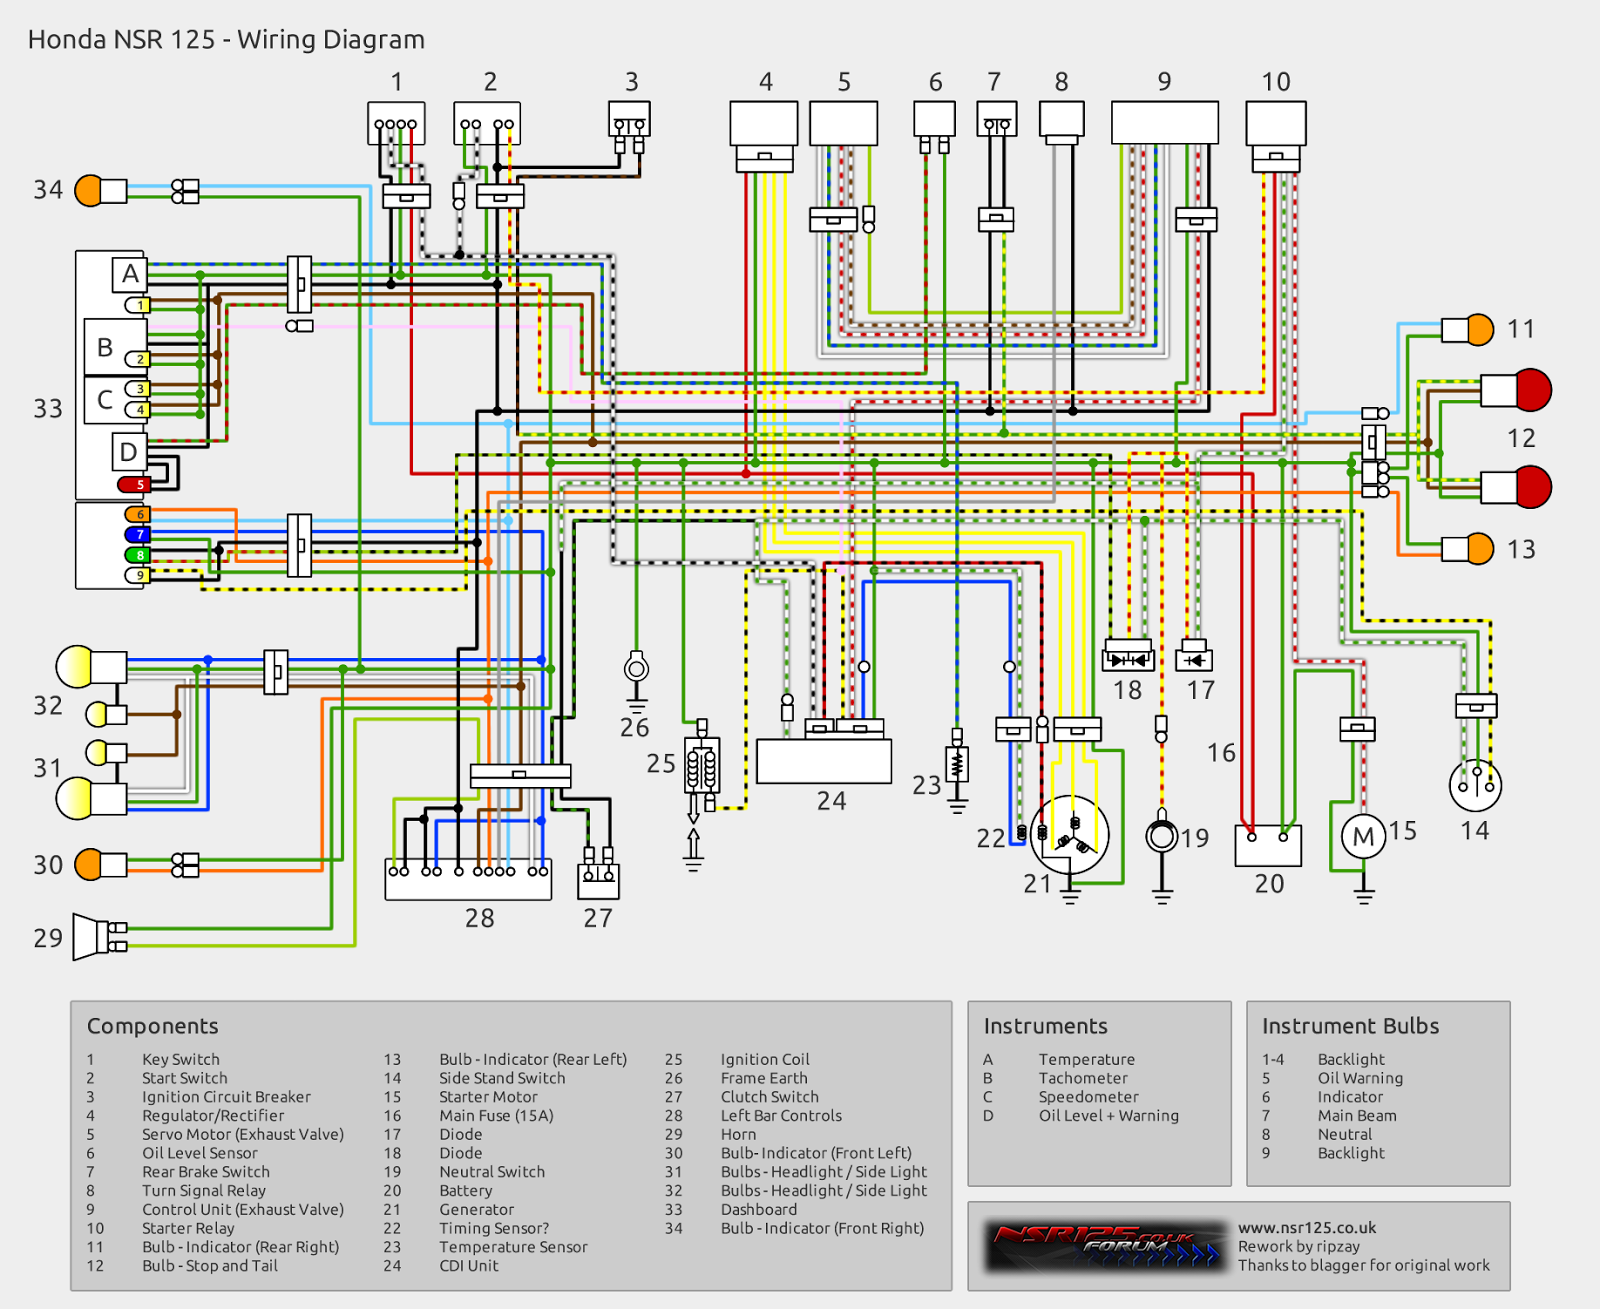 hight resolution of nsr salatiga wiring diagram honda nsr series rh nsrsalatiga blogspot com honda cbr1100xx honda cg125